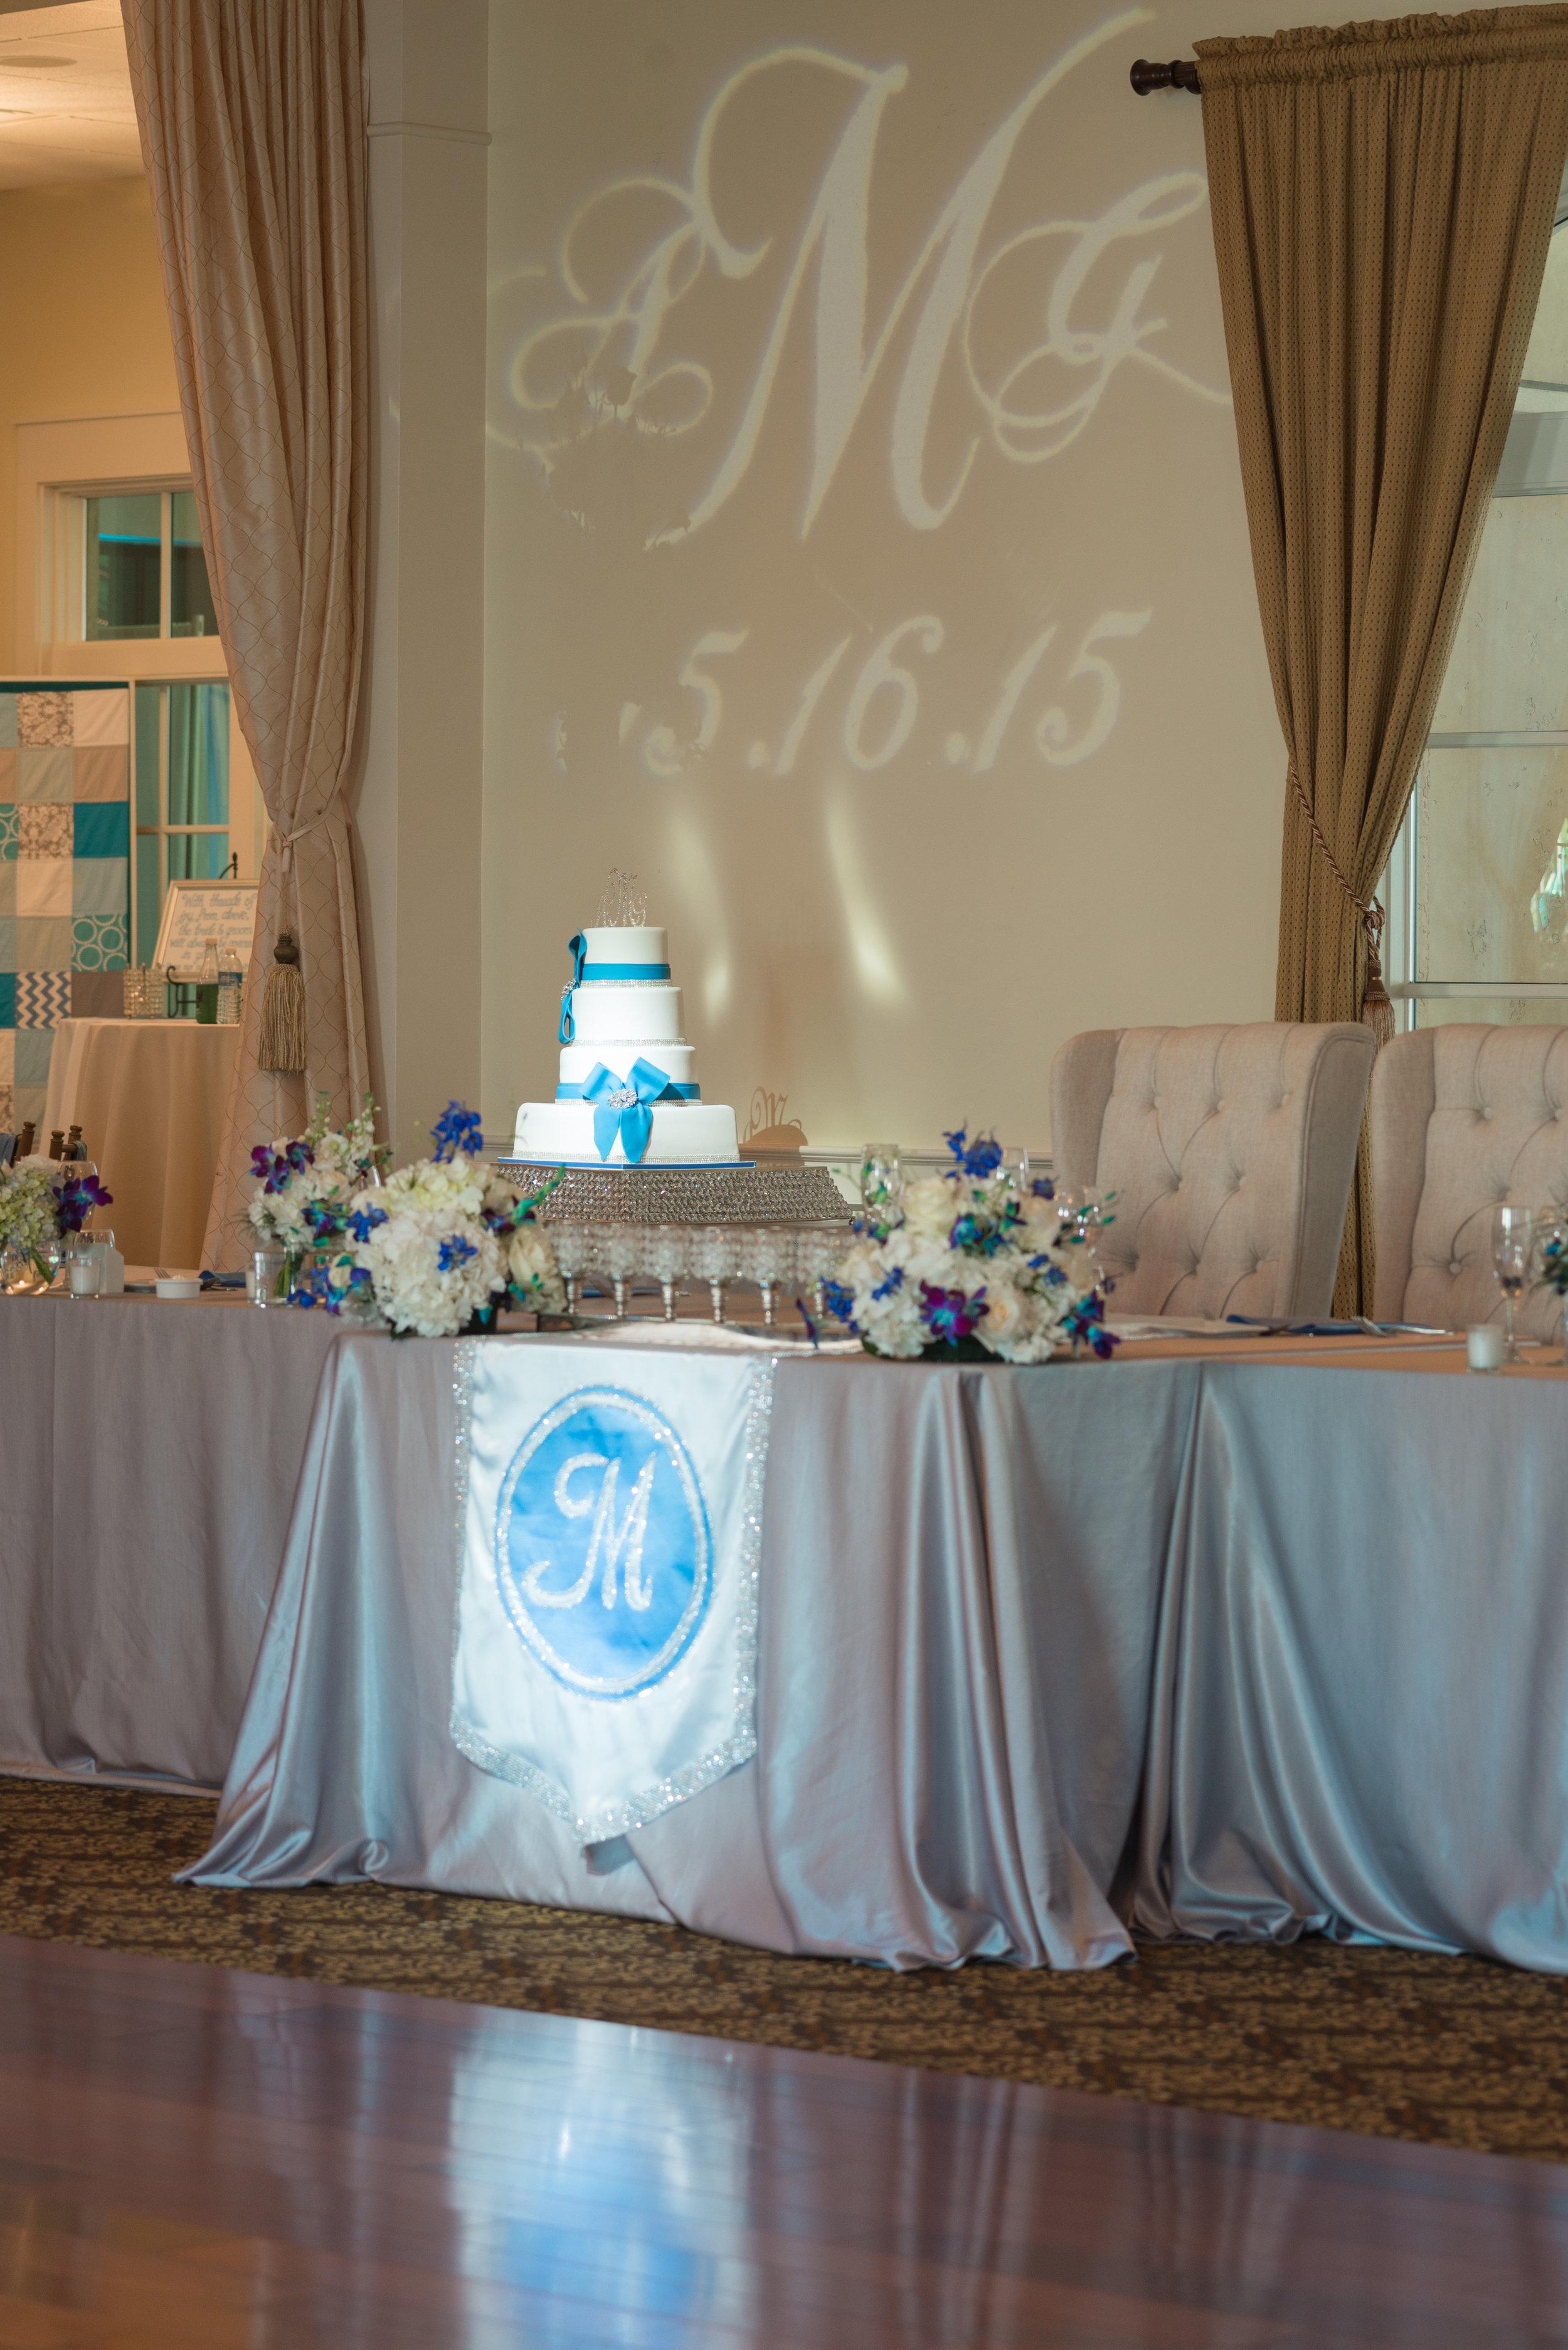 Carl-Kerridge-Photography-North-Beach-Wedding-May-2015-085.jpg